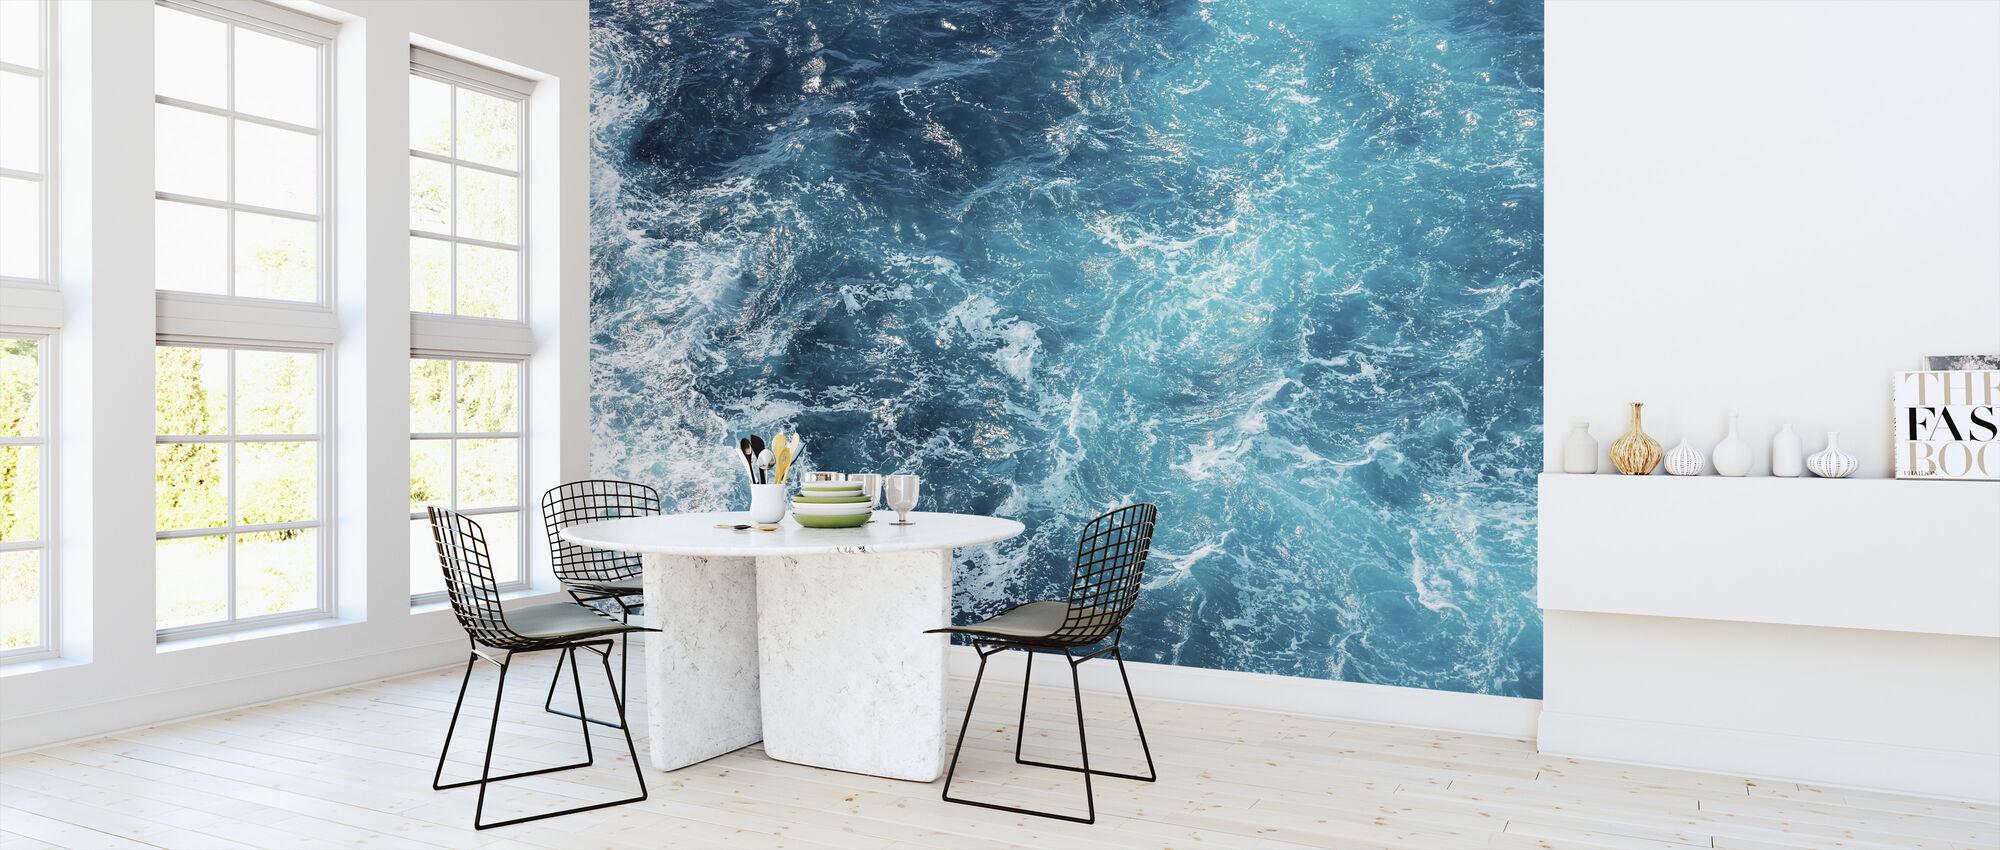 Rough Sea Waves - Wallpaper - Kitchen